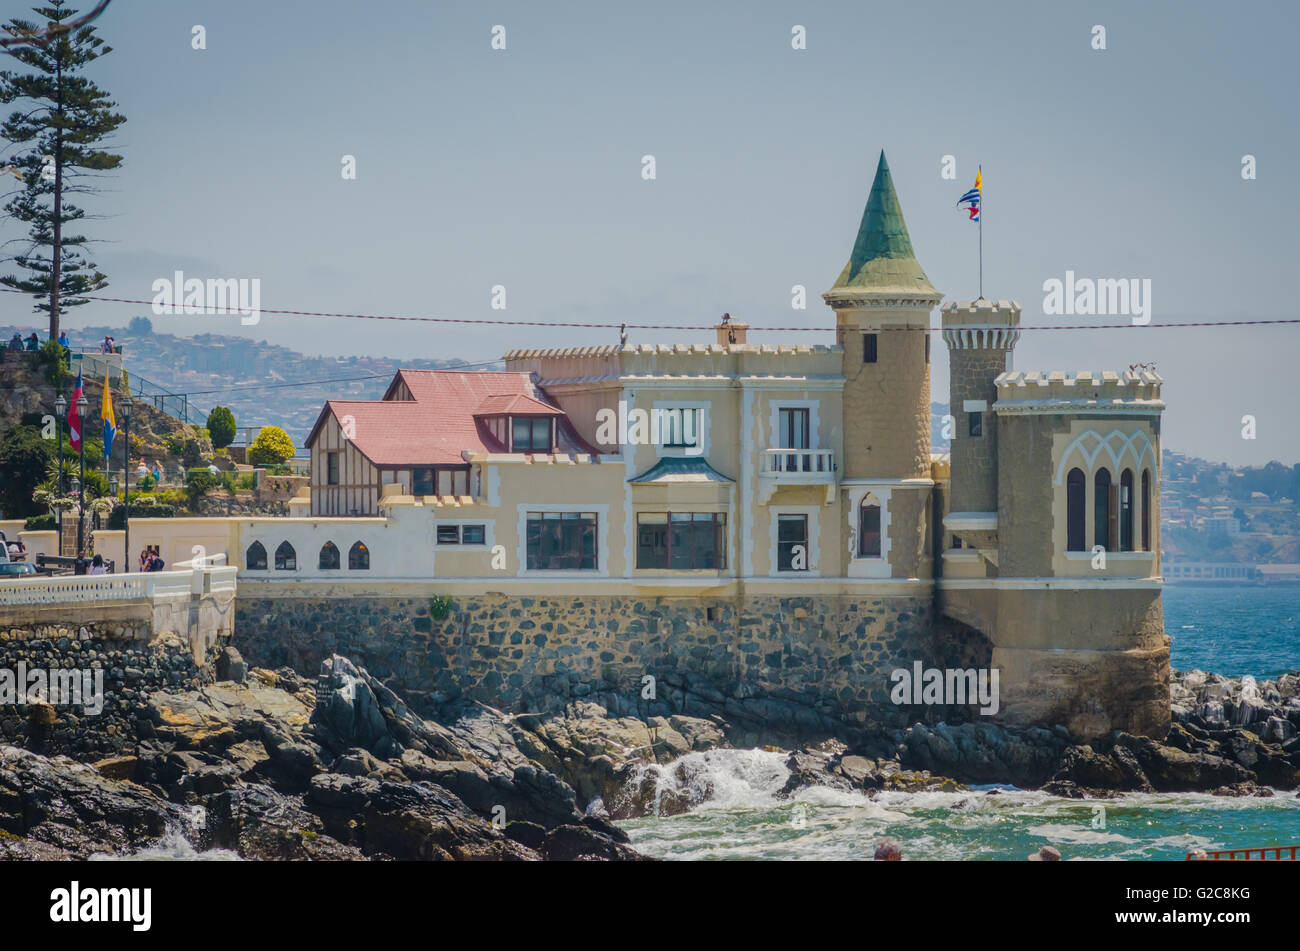 Vina del Mar, Chile - November 01 2014: Wulff Castle in Vina del Mar, Chile. - Stock Image